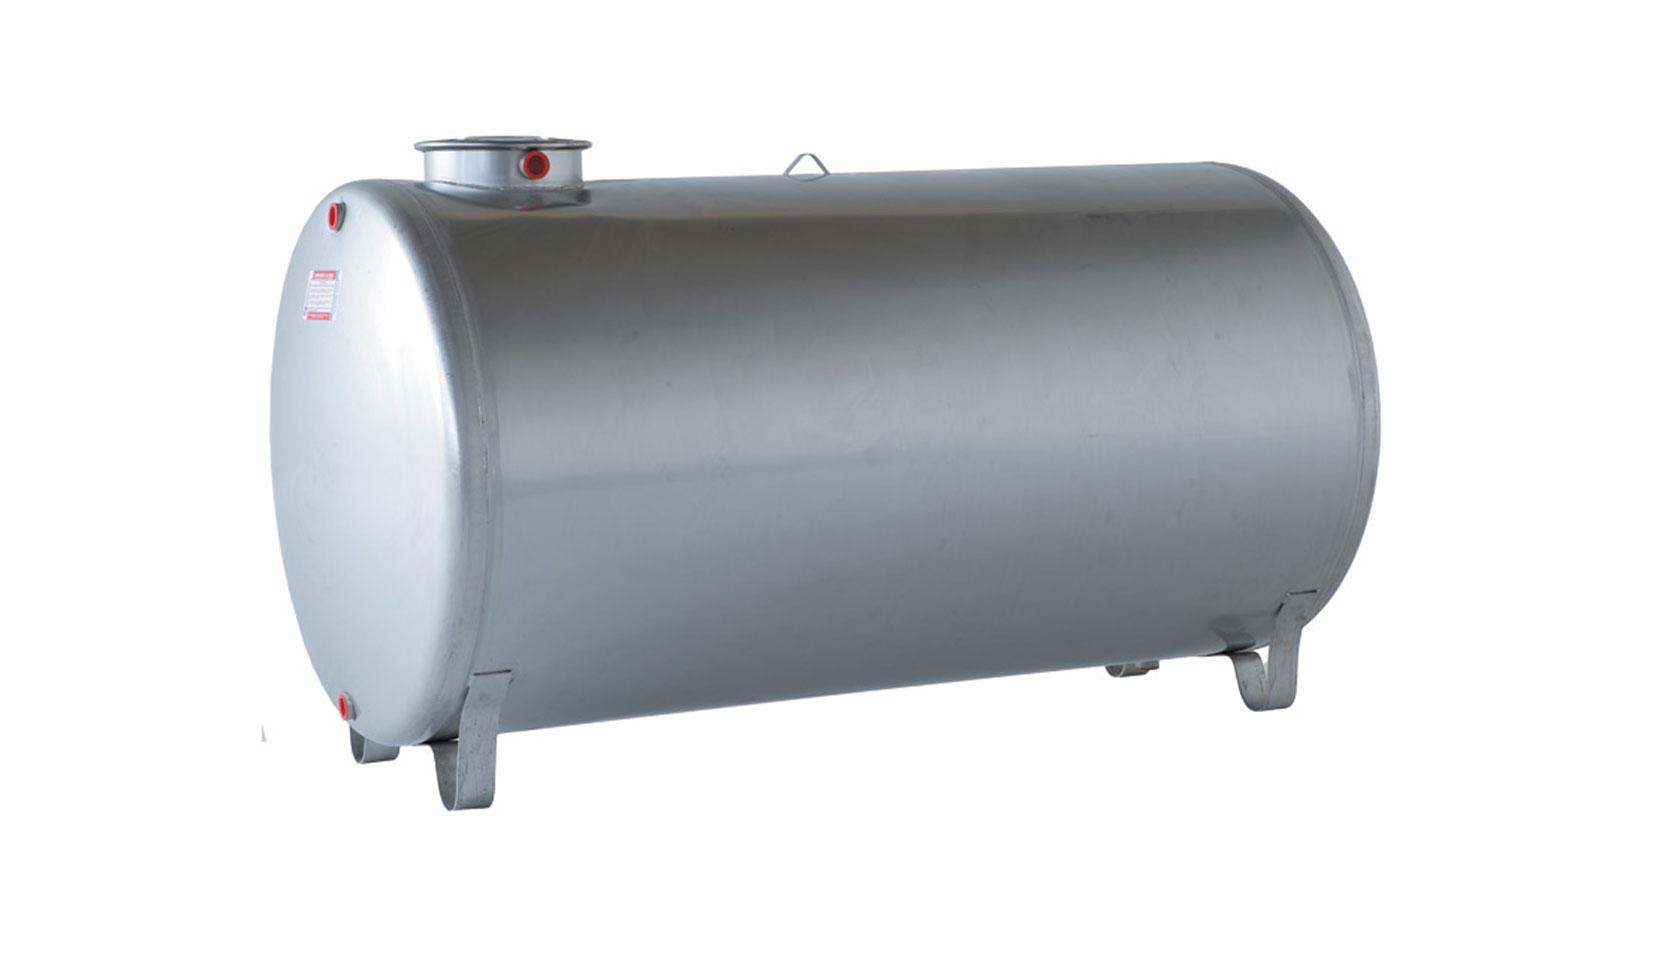 serbatoio acciaio inox 300 litri orizzontale aisi 304